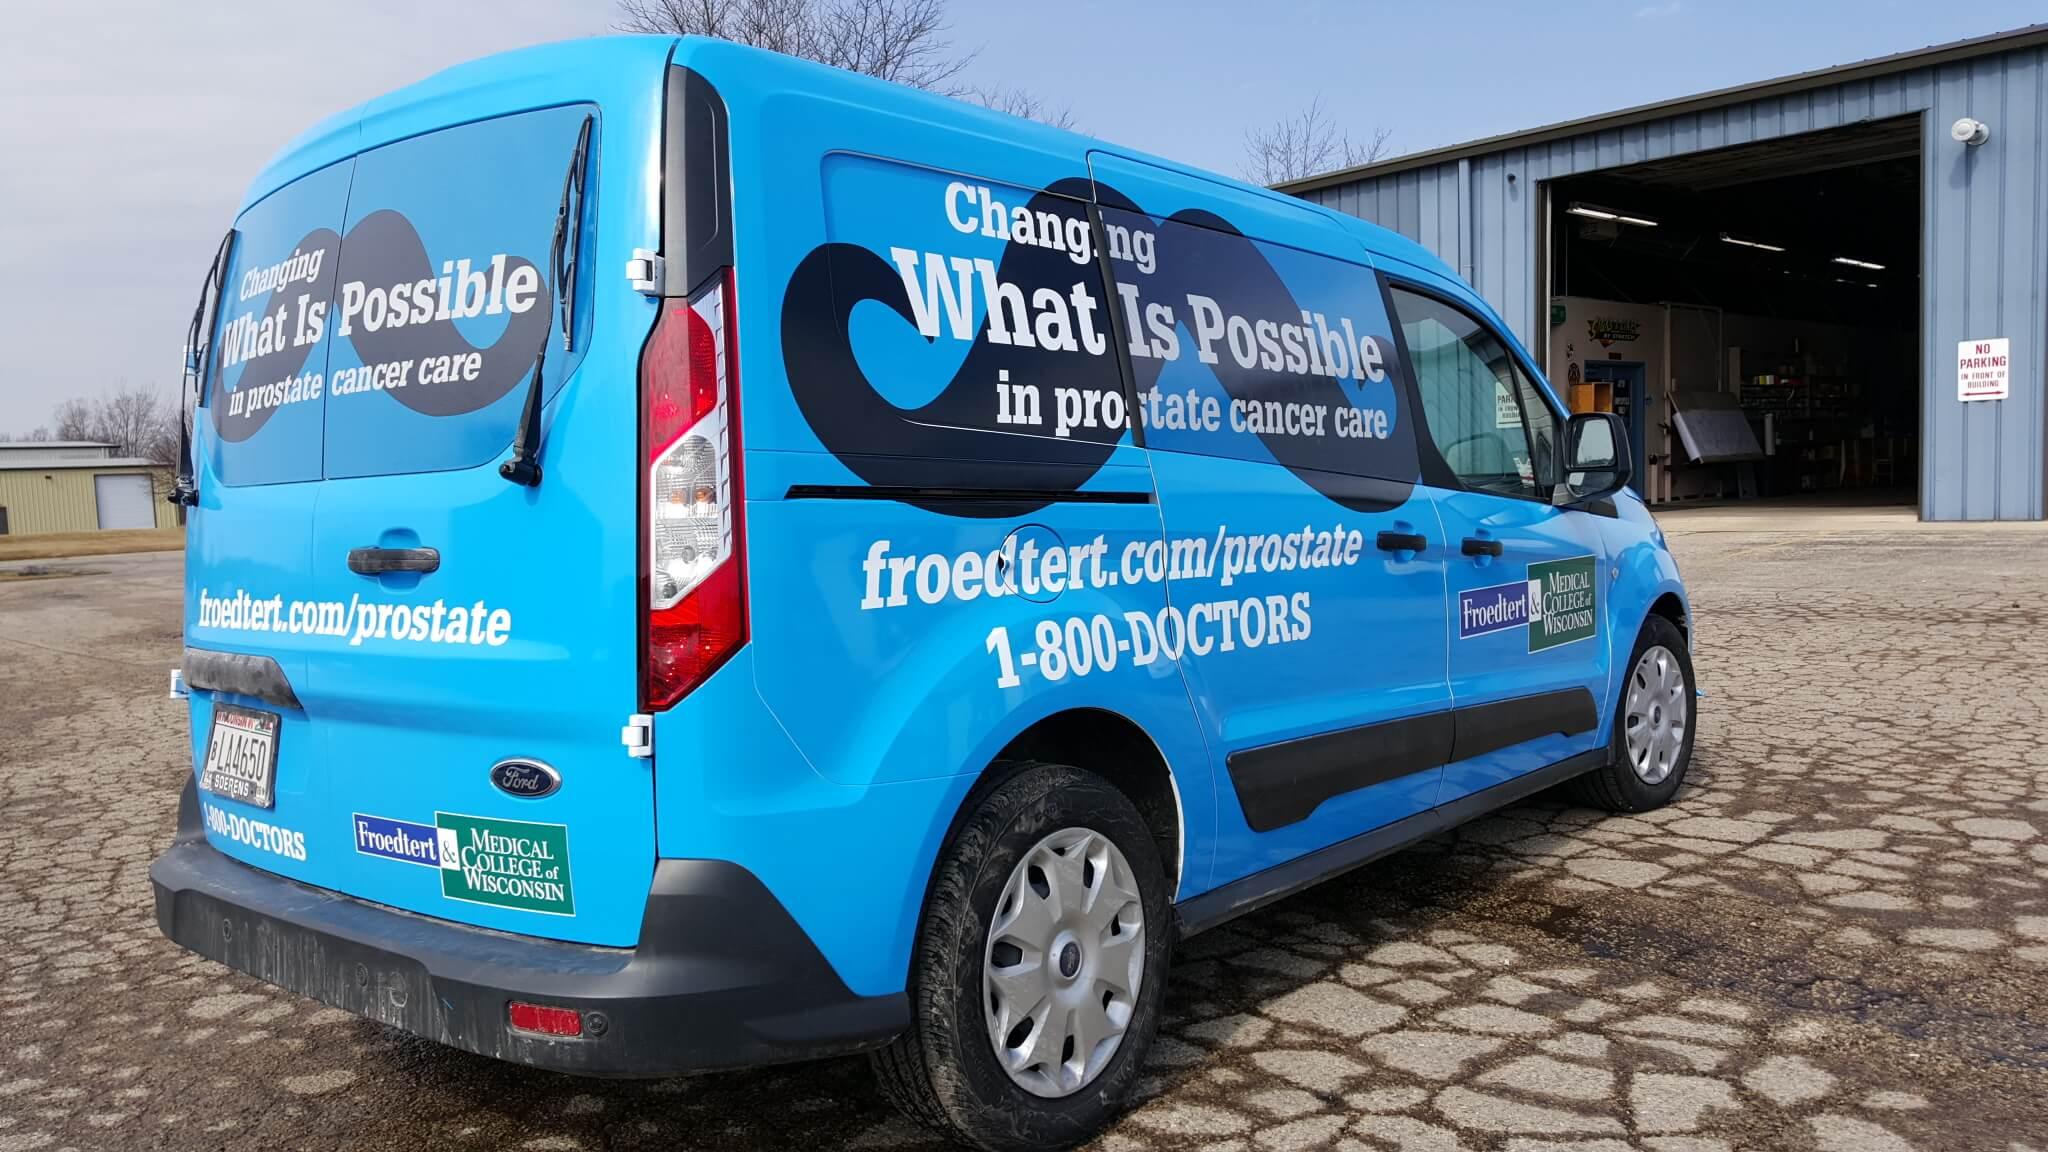 Frodert fleet vehicle wraps